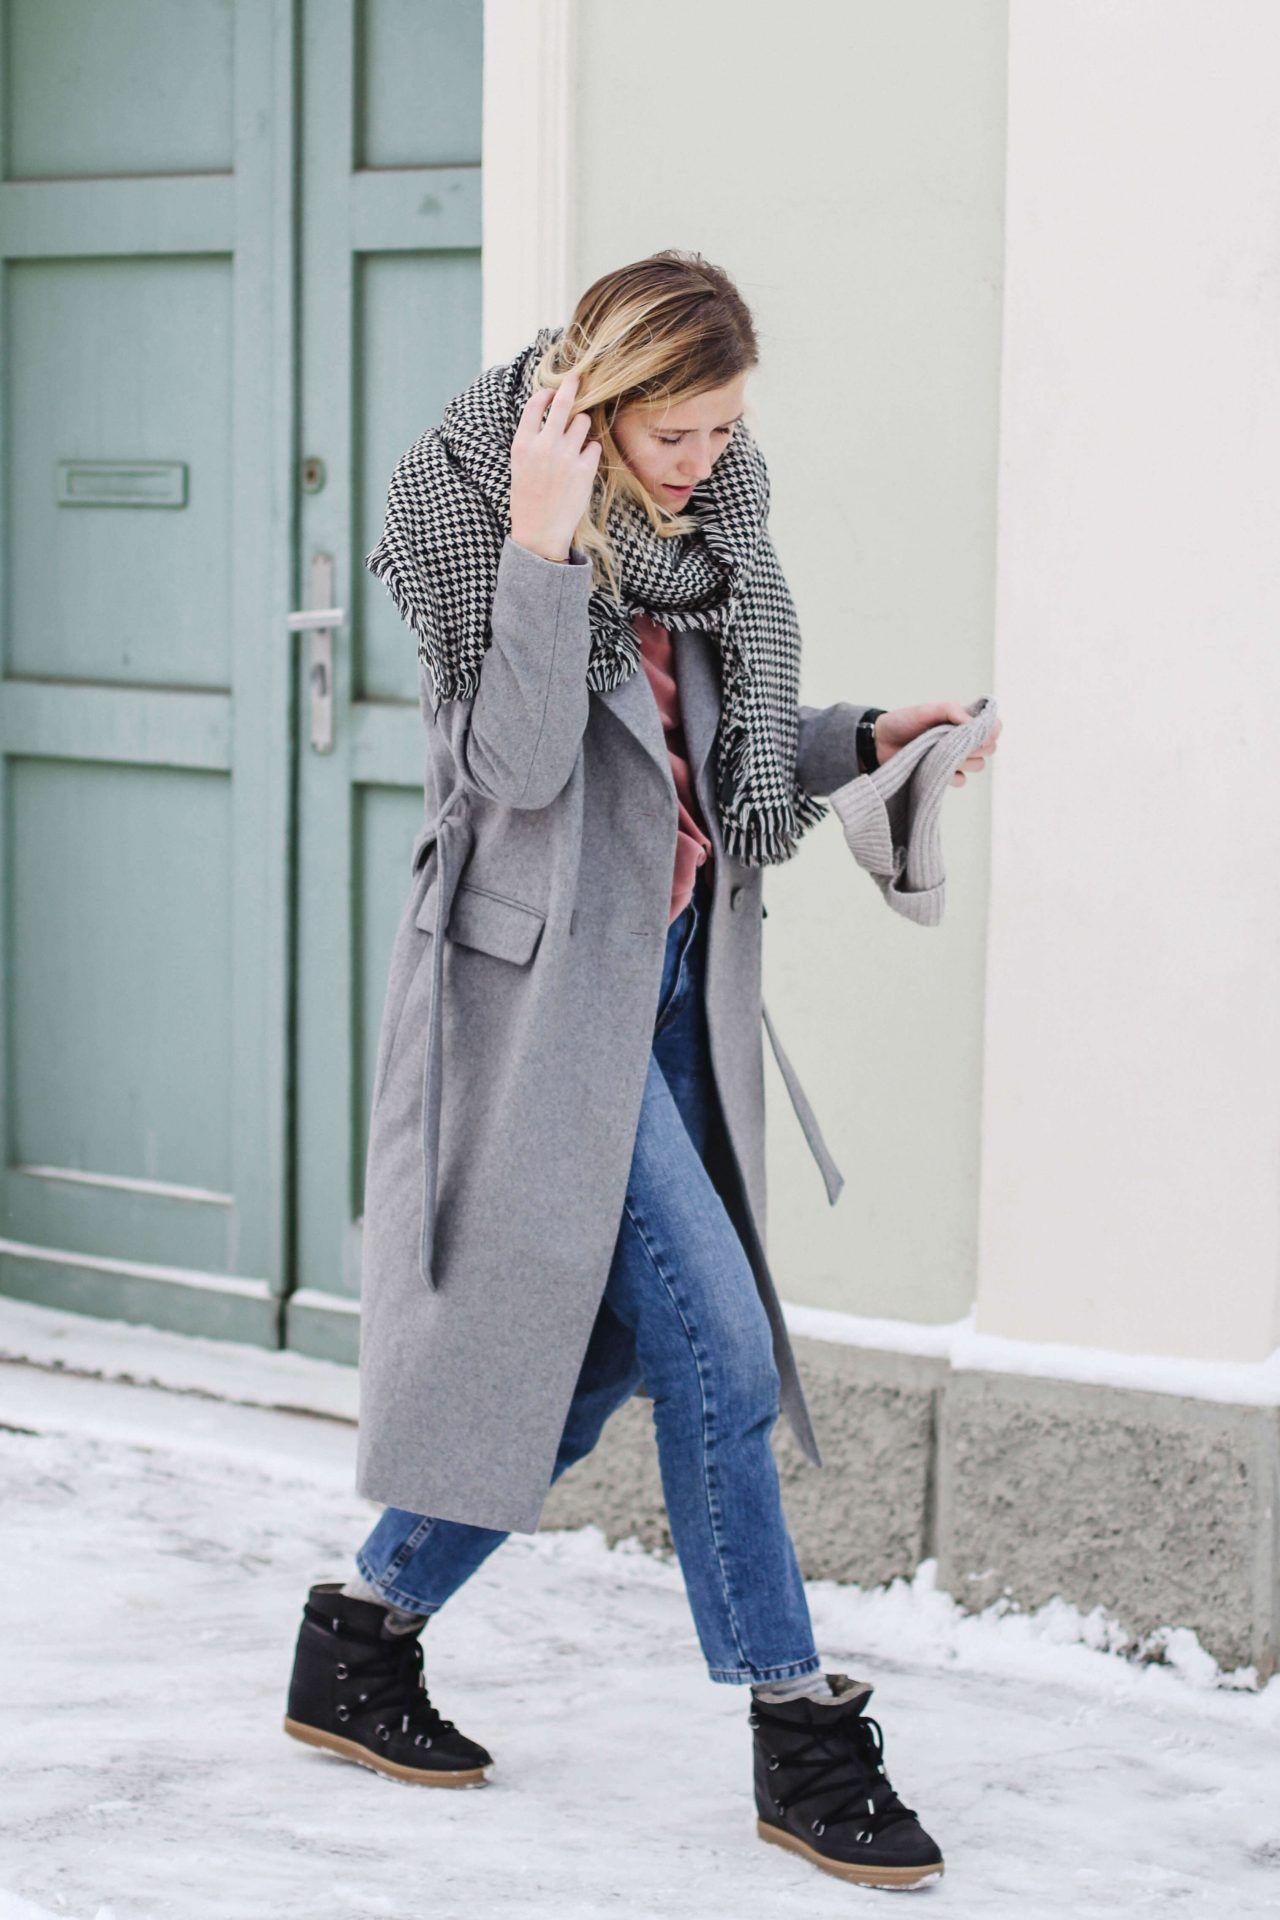 tifmys – Coat: Minimum   Sweater and hat: H&M   Jeans: Envii